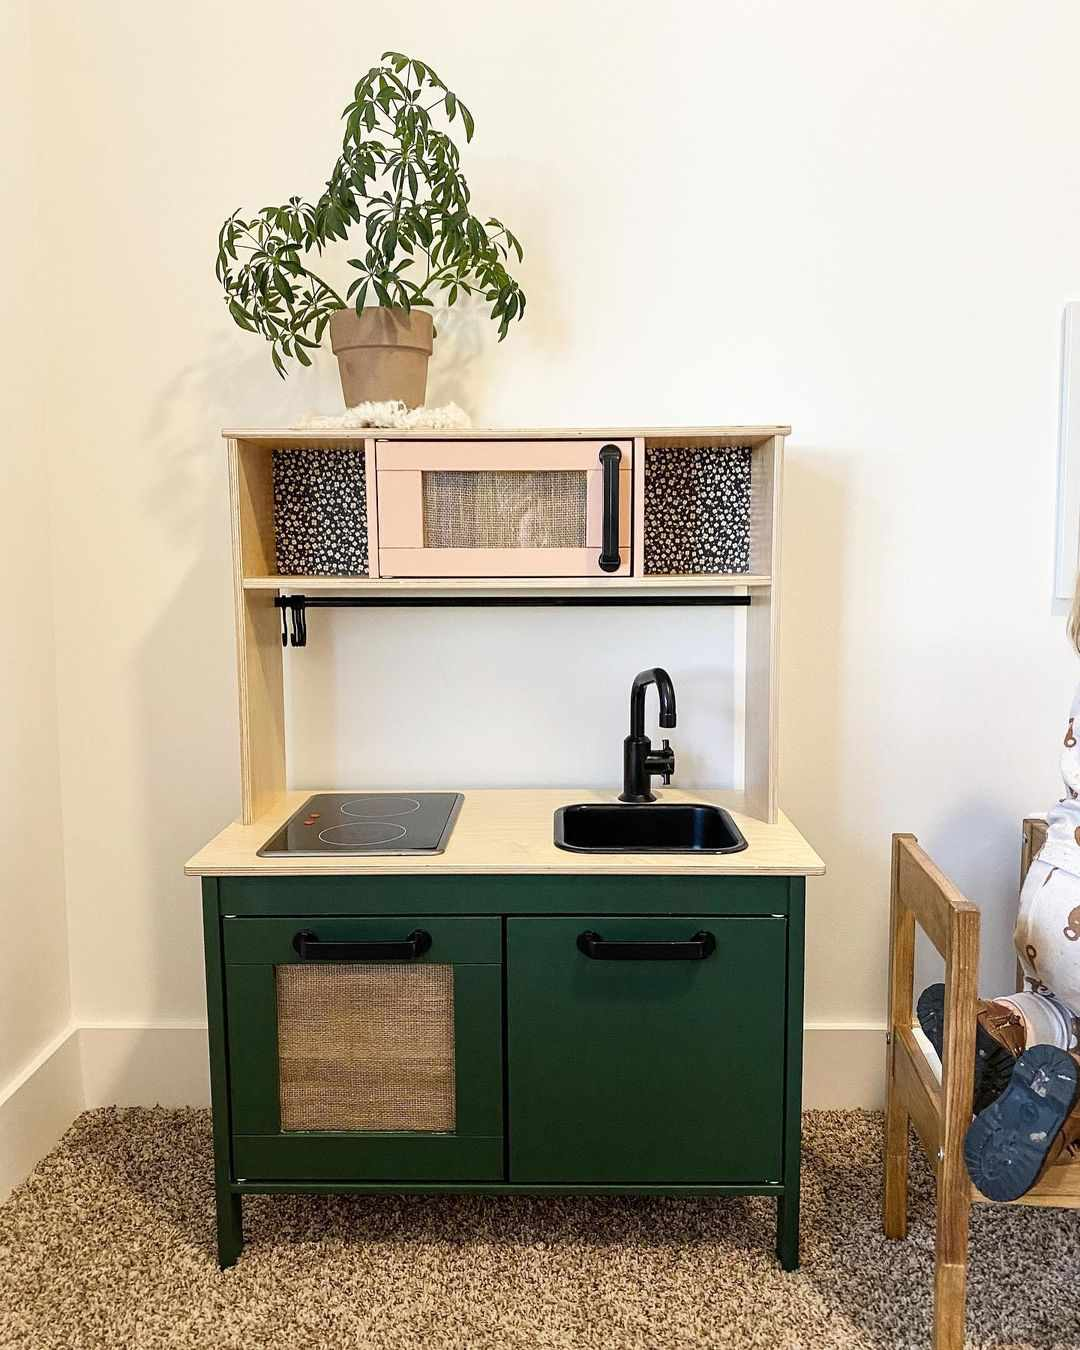 Sage green playhouse